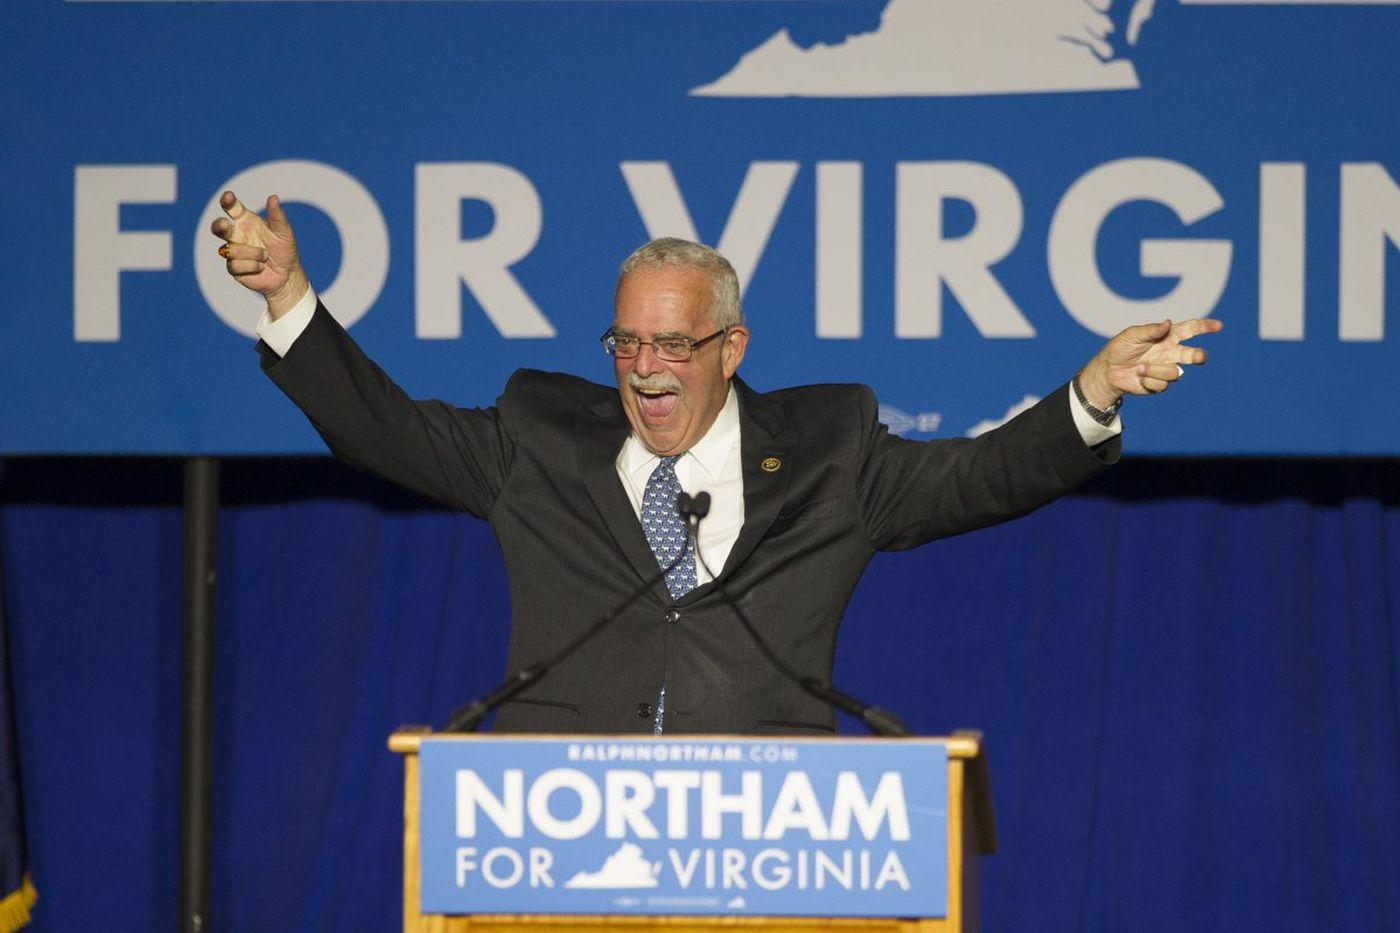 Democrats hit back in New Jersey, Virginia, signaling danger for Trump, GOP